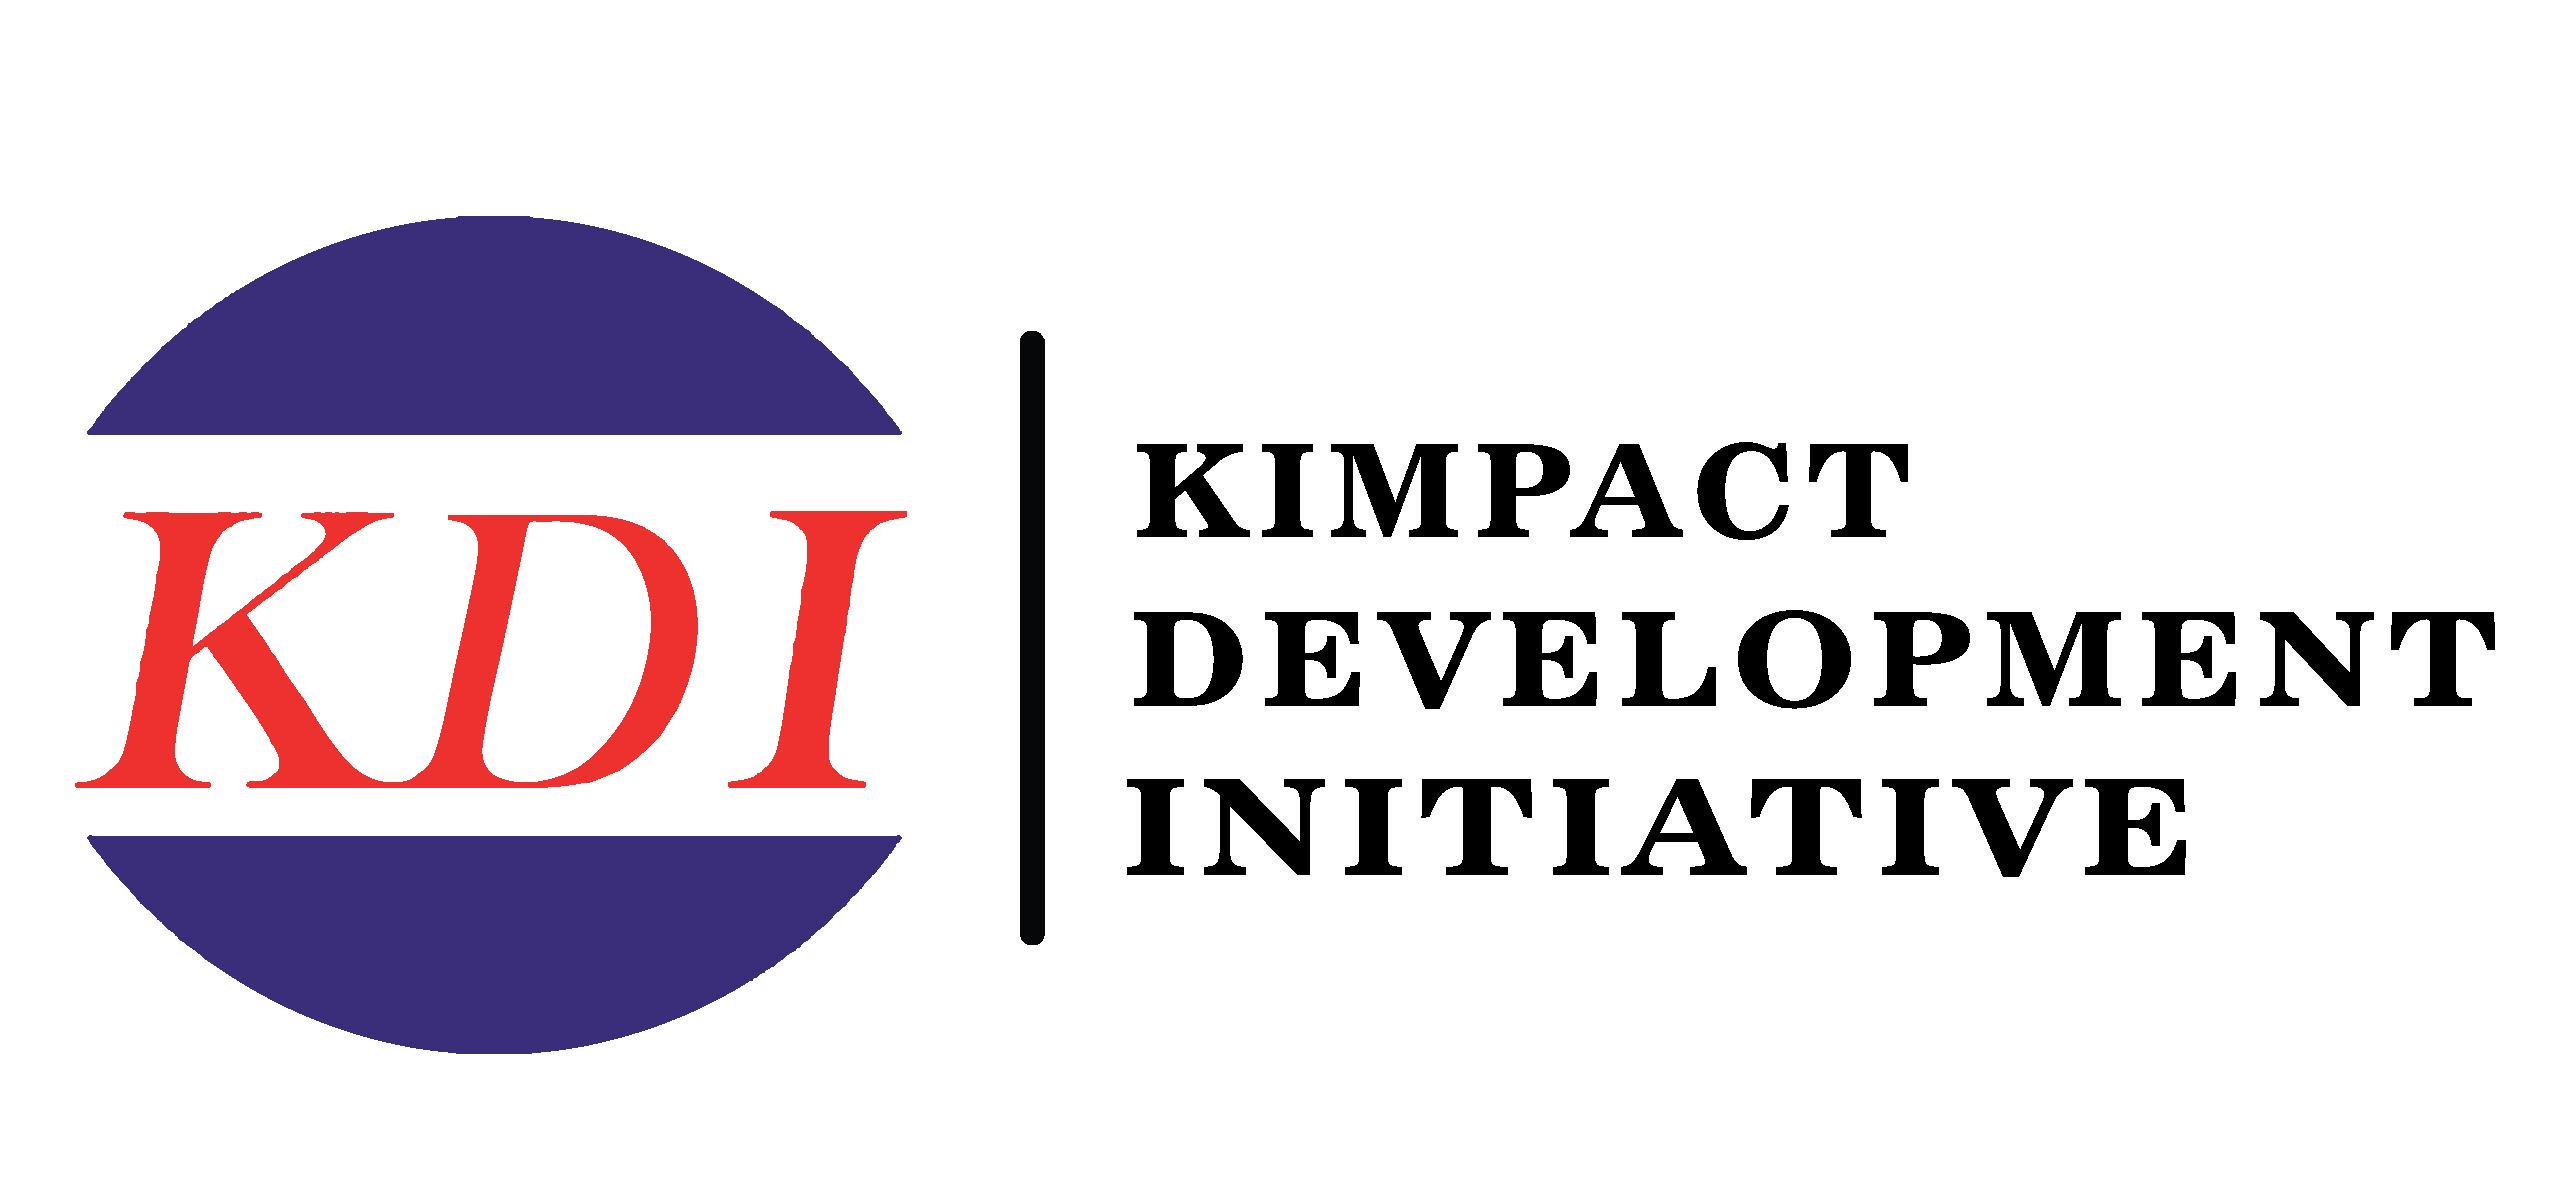 Kimpact Development Initiative